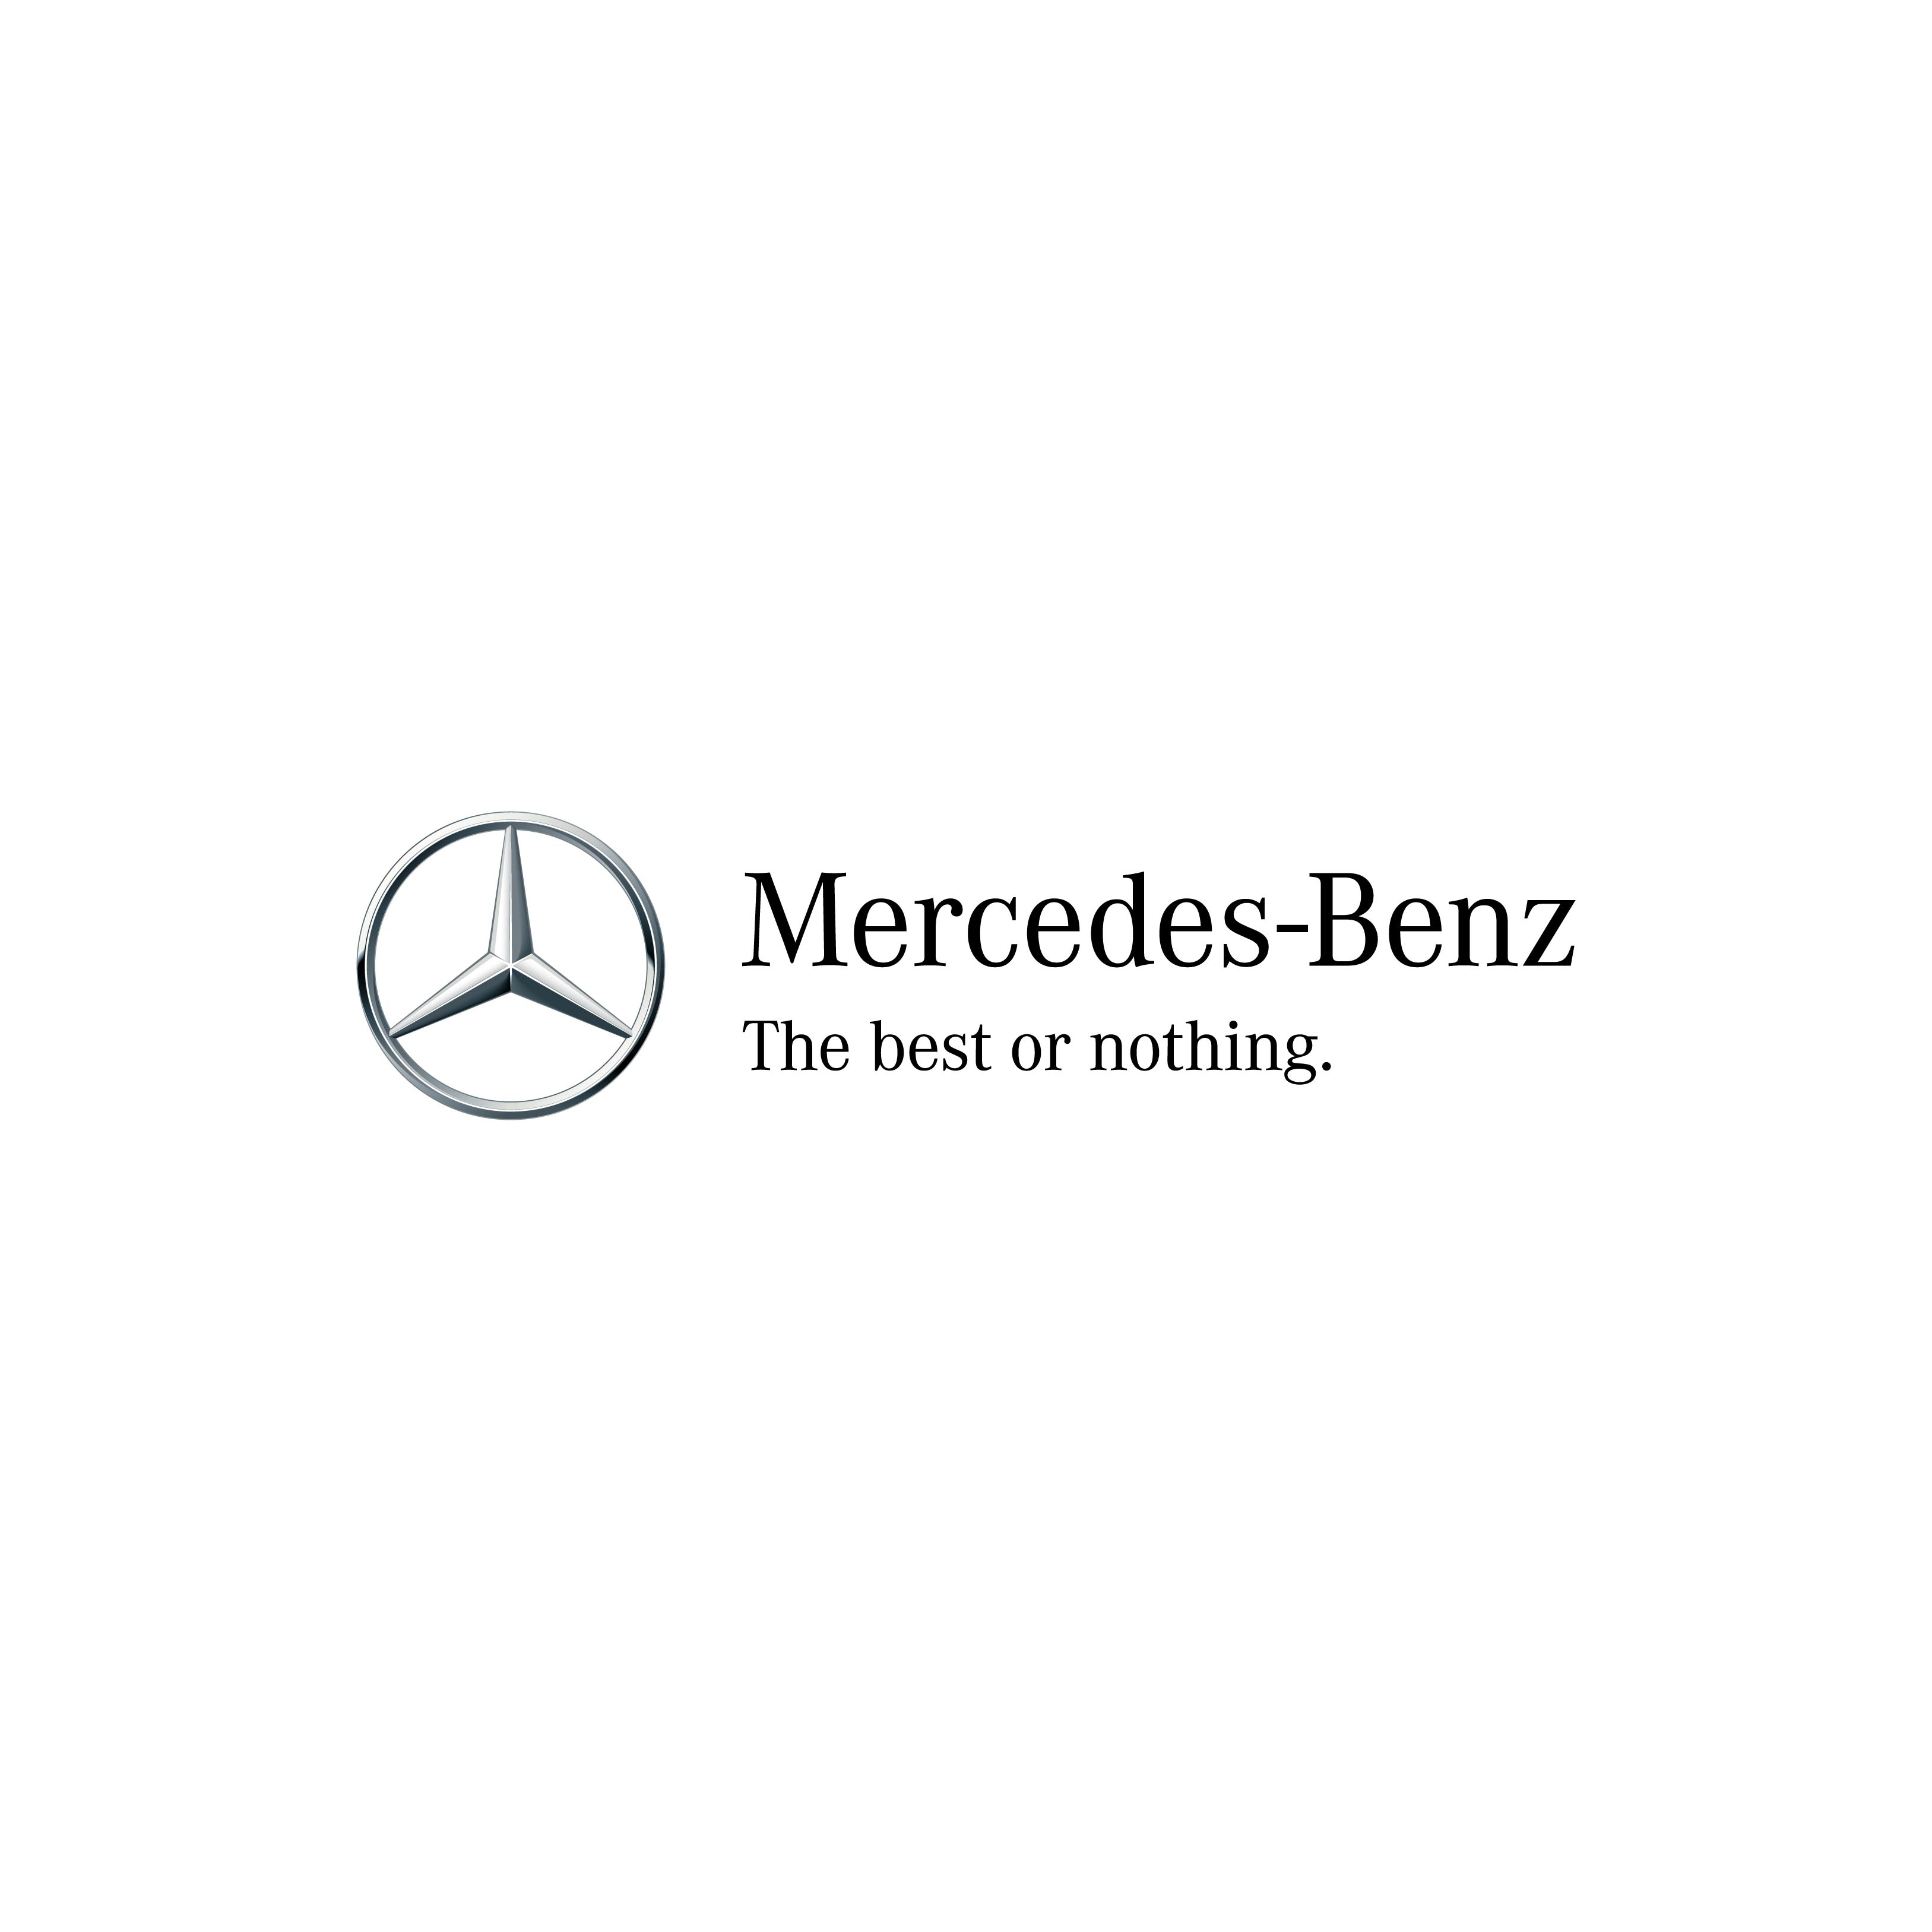 Used car dealers in portland oregon united states for Mercedes benz of portland portland or